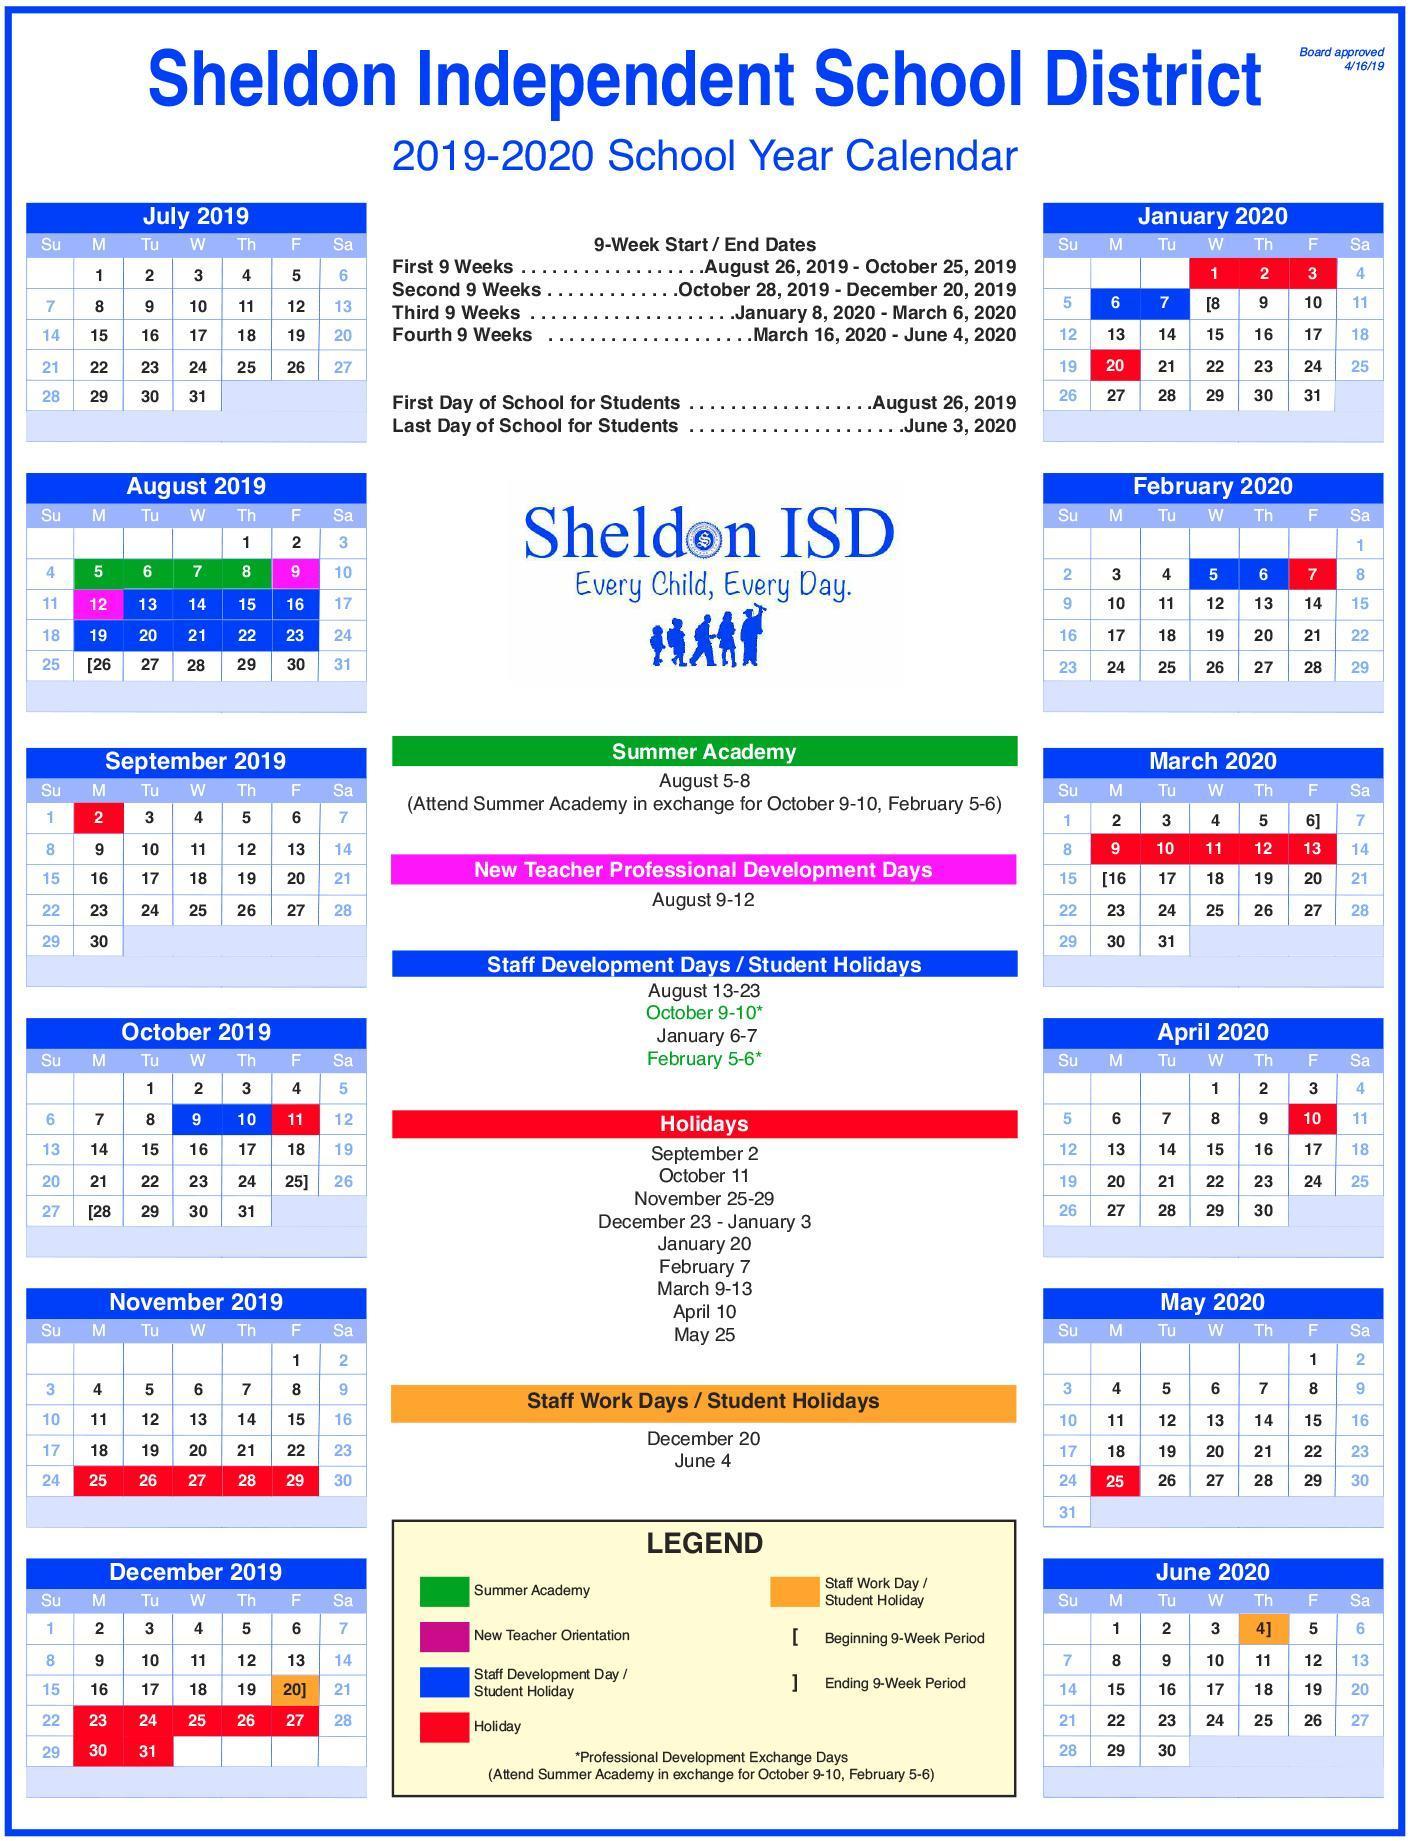 Sheldon Isd pertaining to U Of M 2019 2020 Calendar